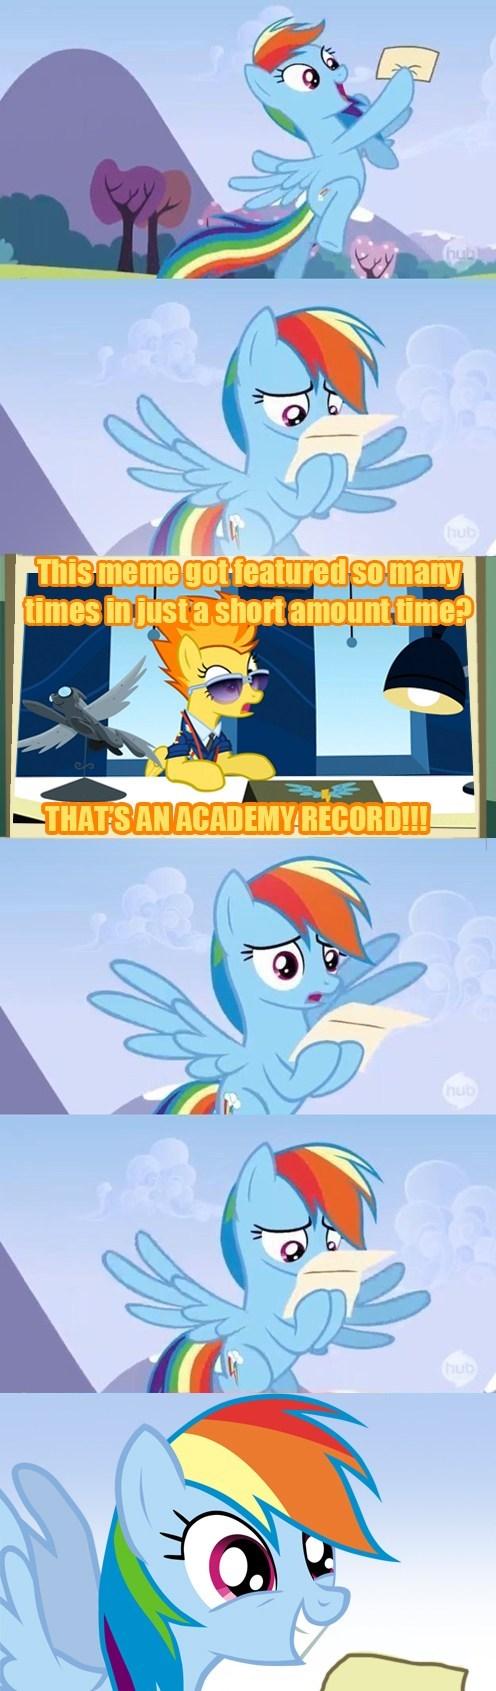 academy record Memes rainbow dash - 7706847488